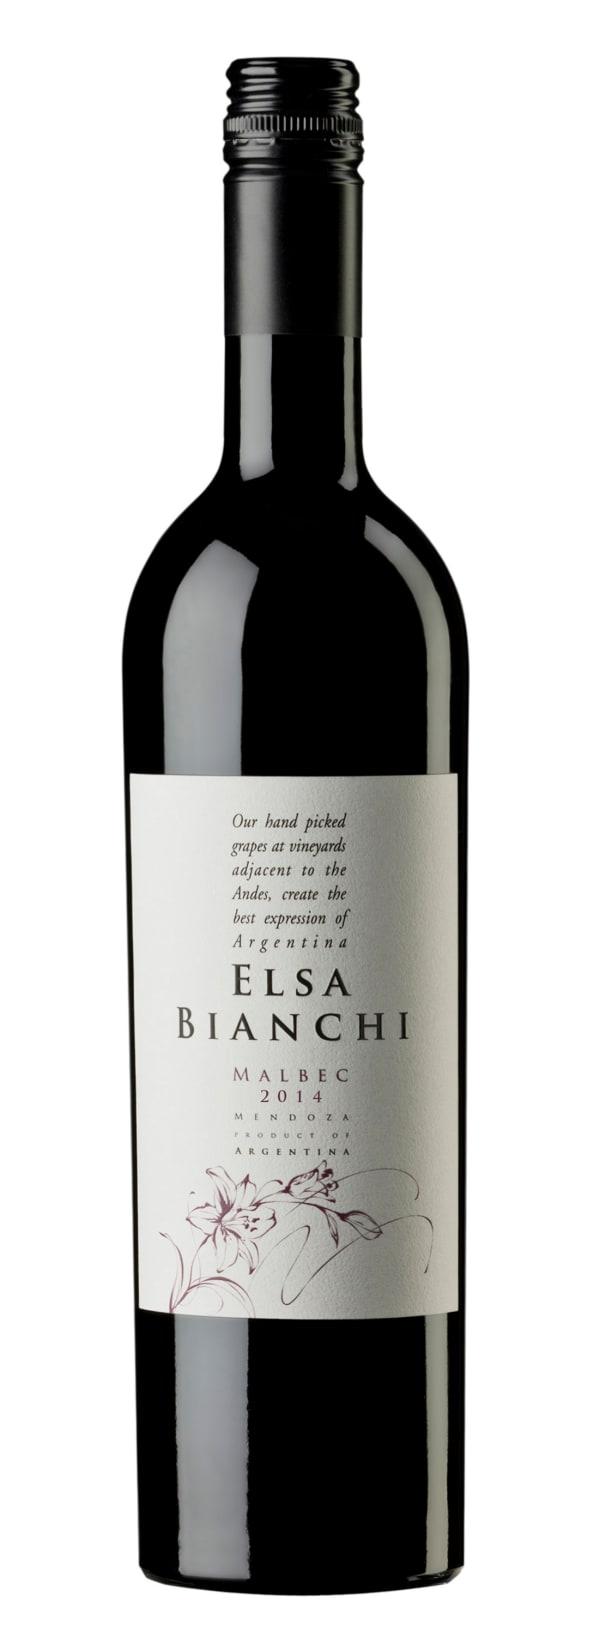 Elsa Bianchi Malbec 2018